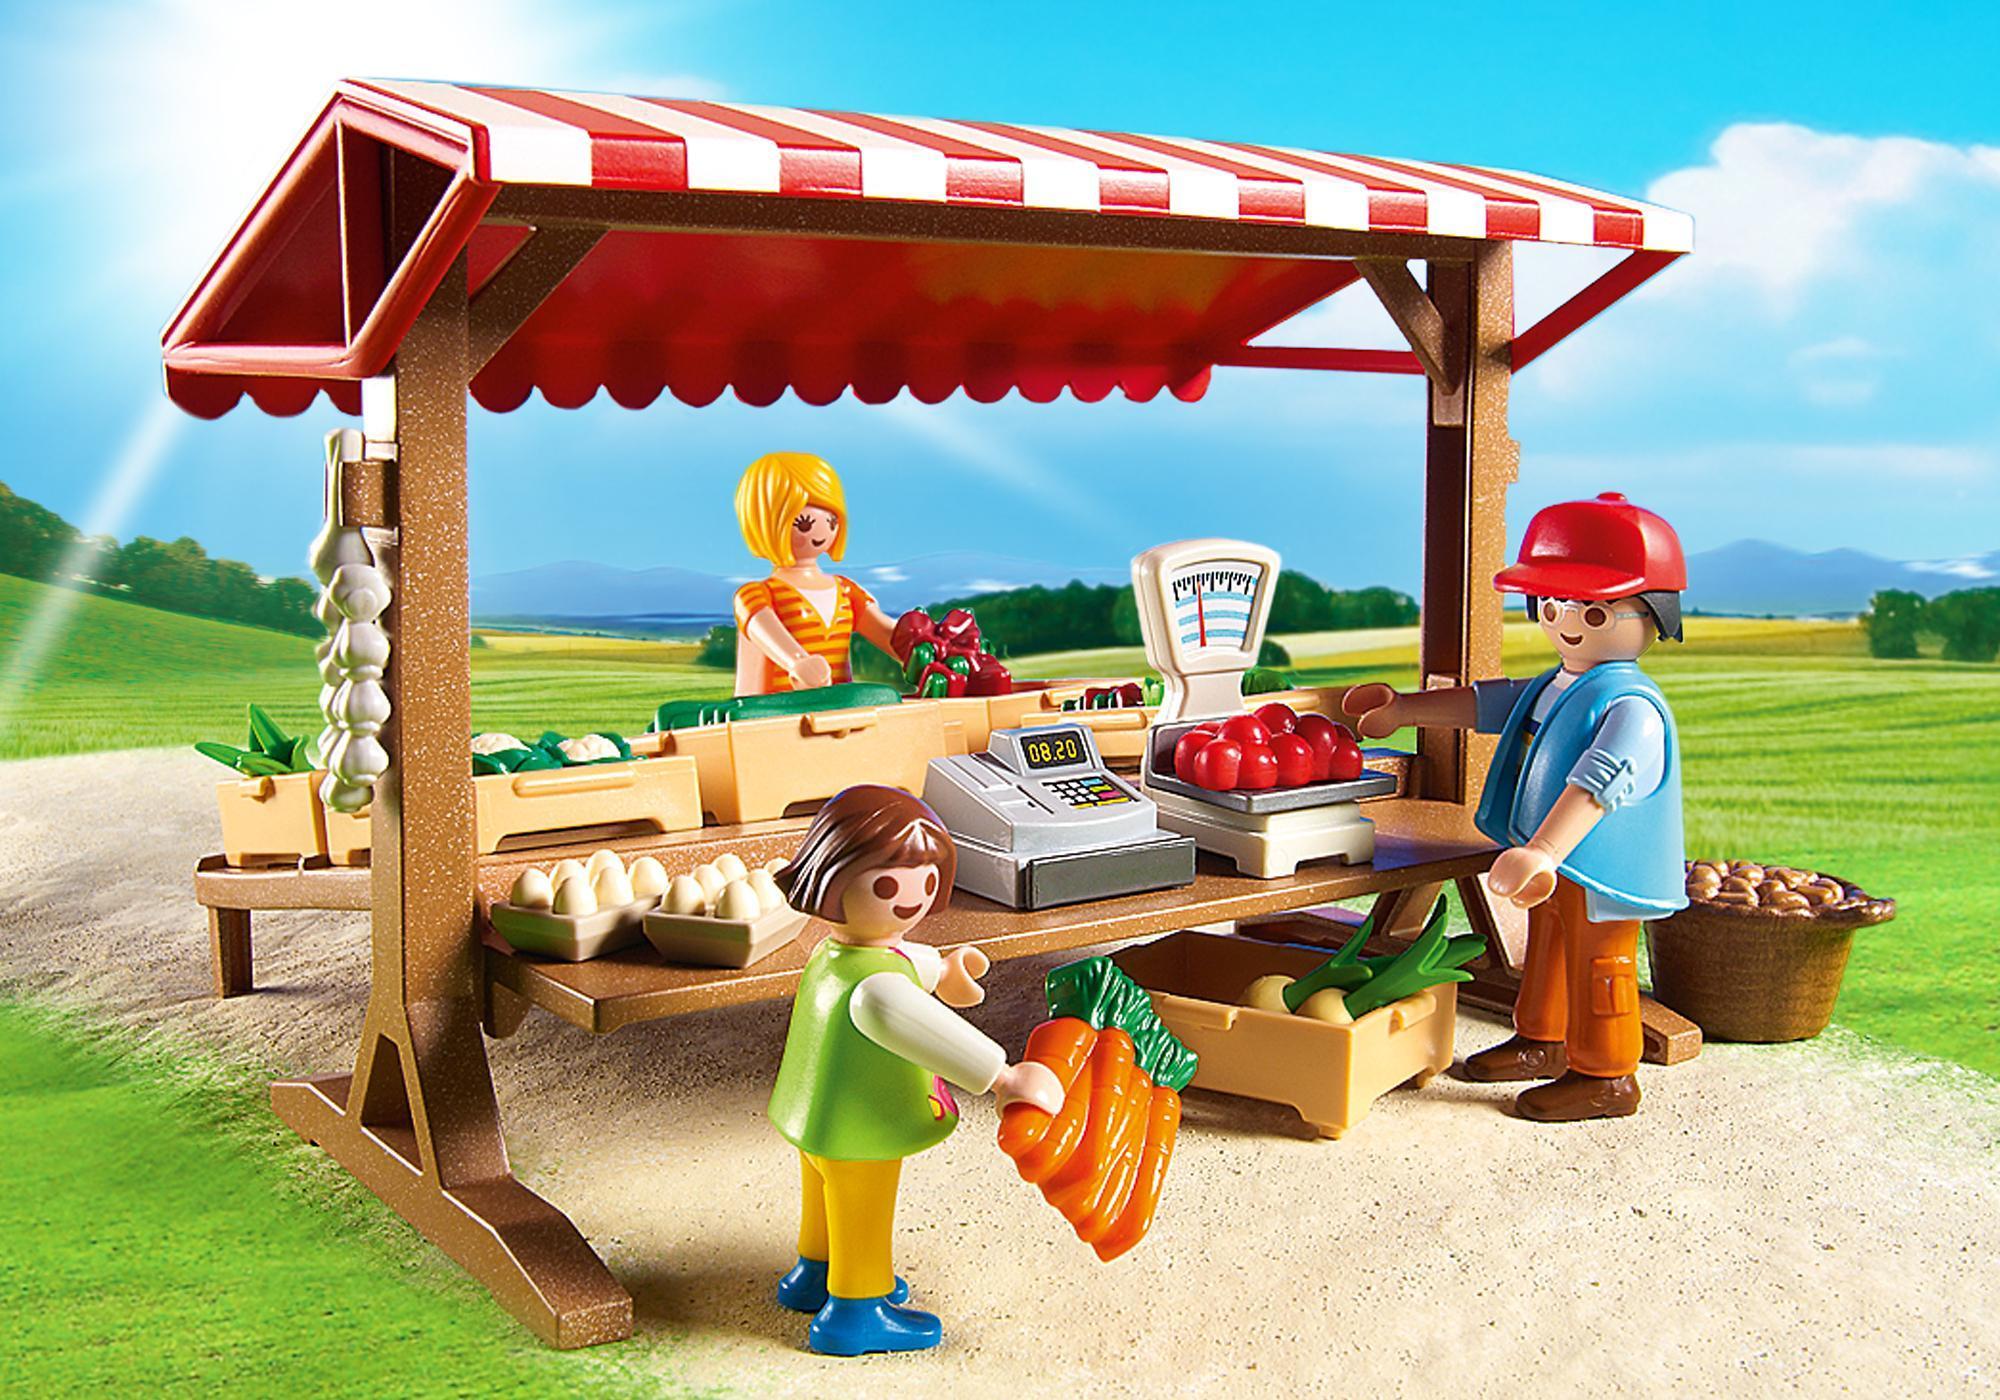 http://media.playmobil.com/i/playmobil/6121_product_extra1/Gemüsestand